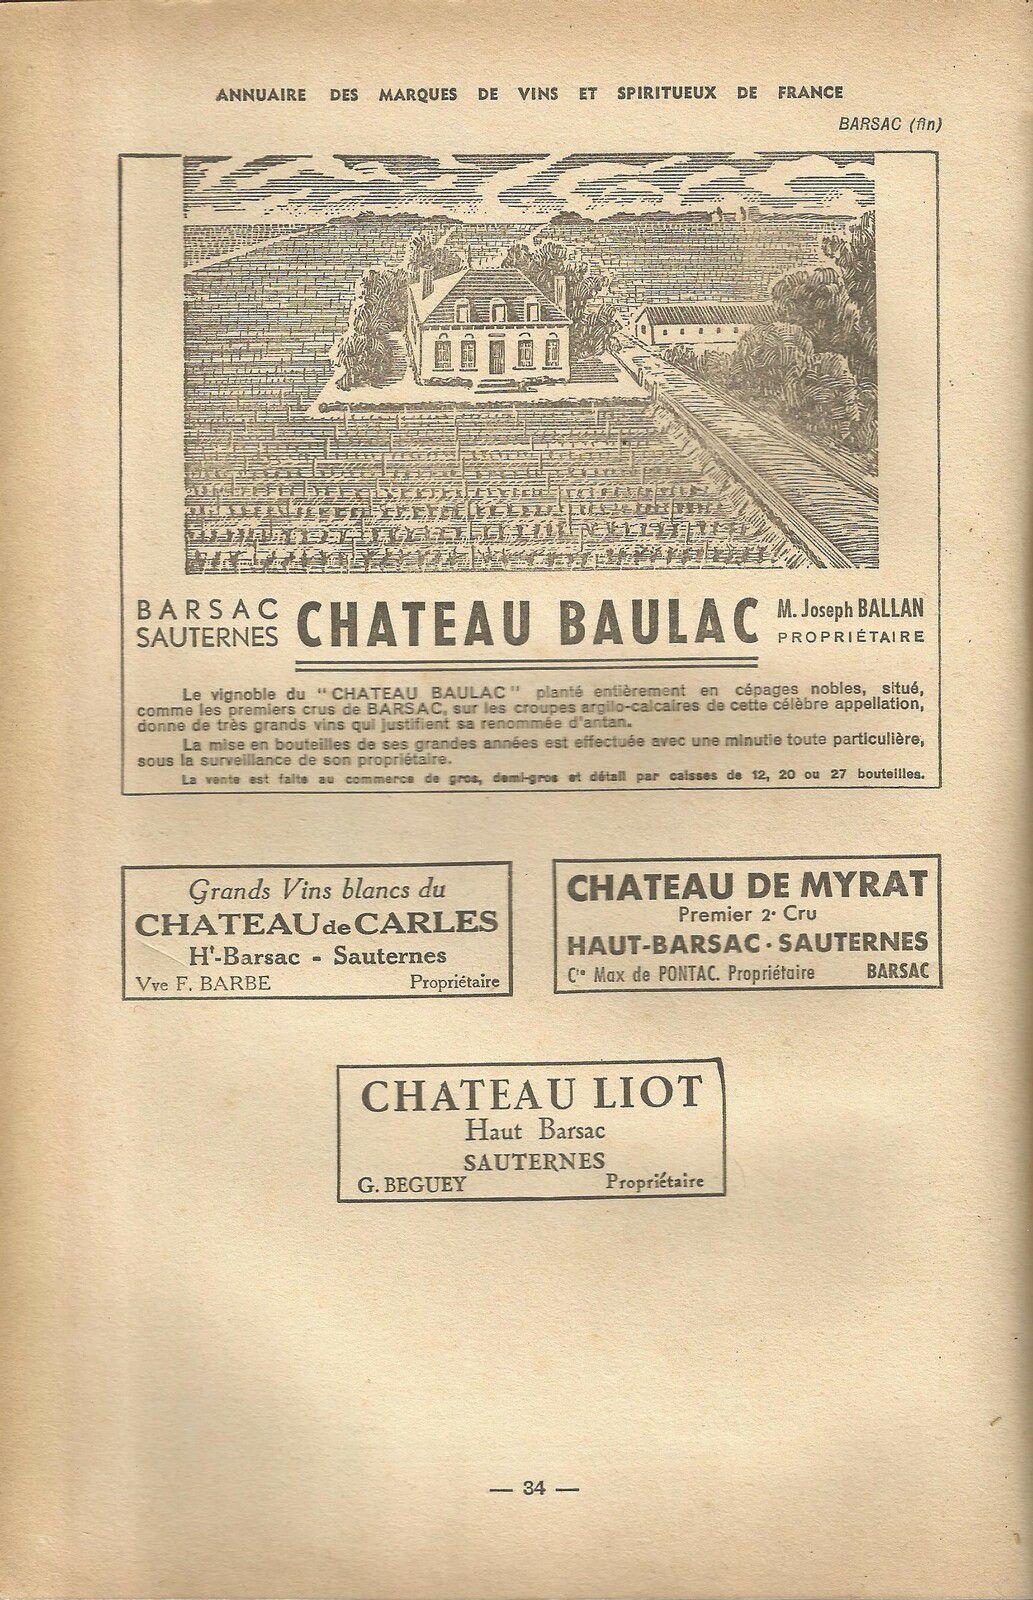 Le terroir de Barsac en 1941